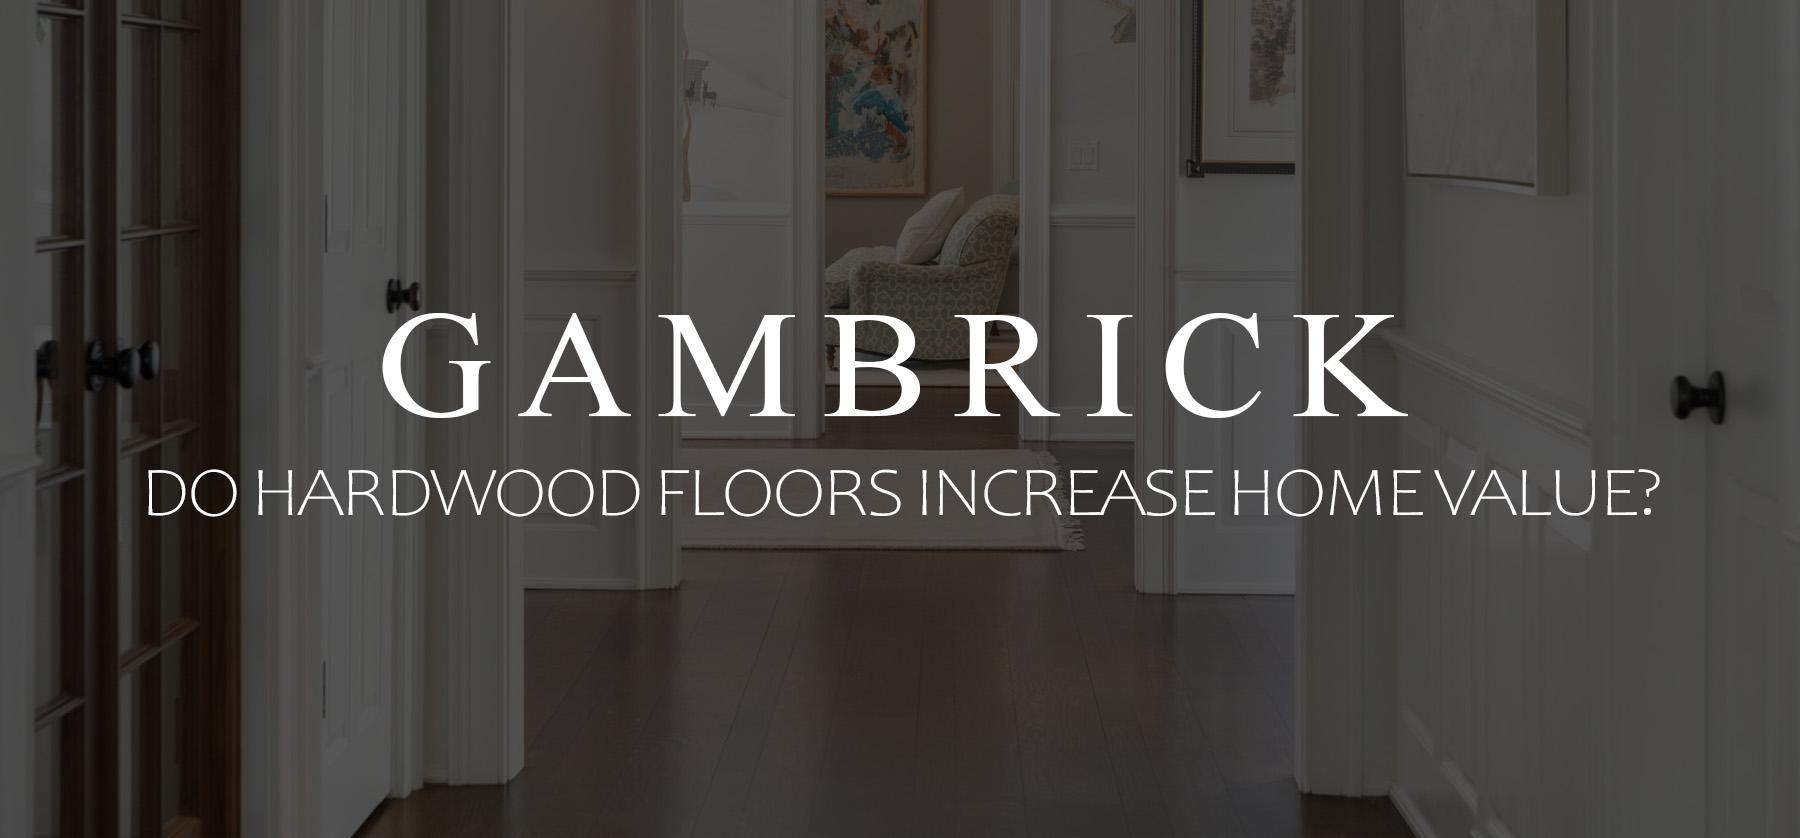 Do hardwood Floors Increase Home Value Banner